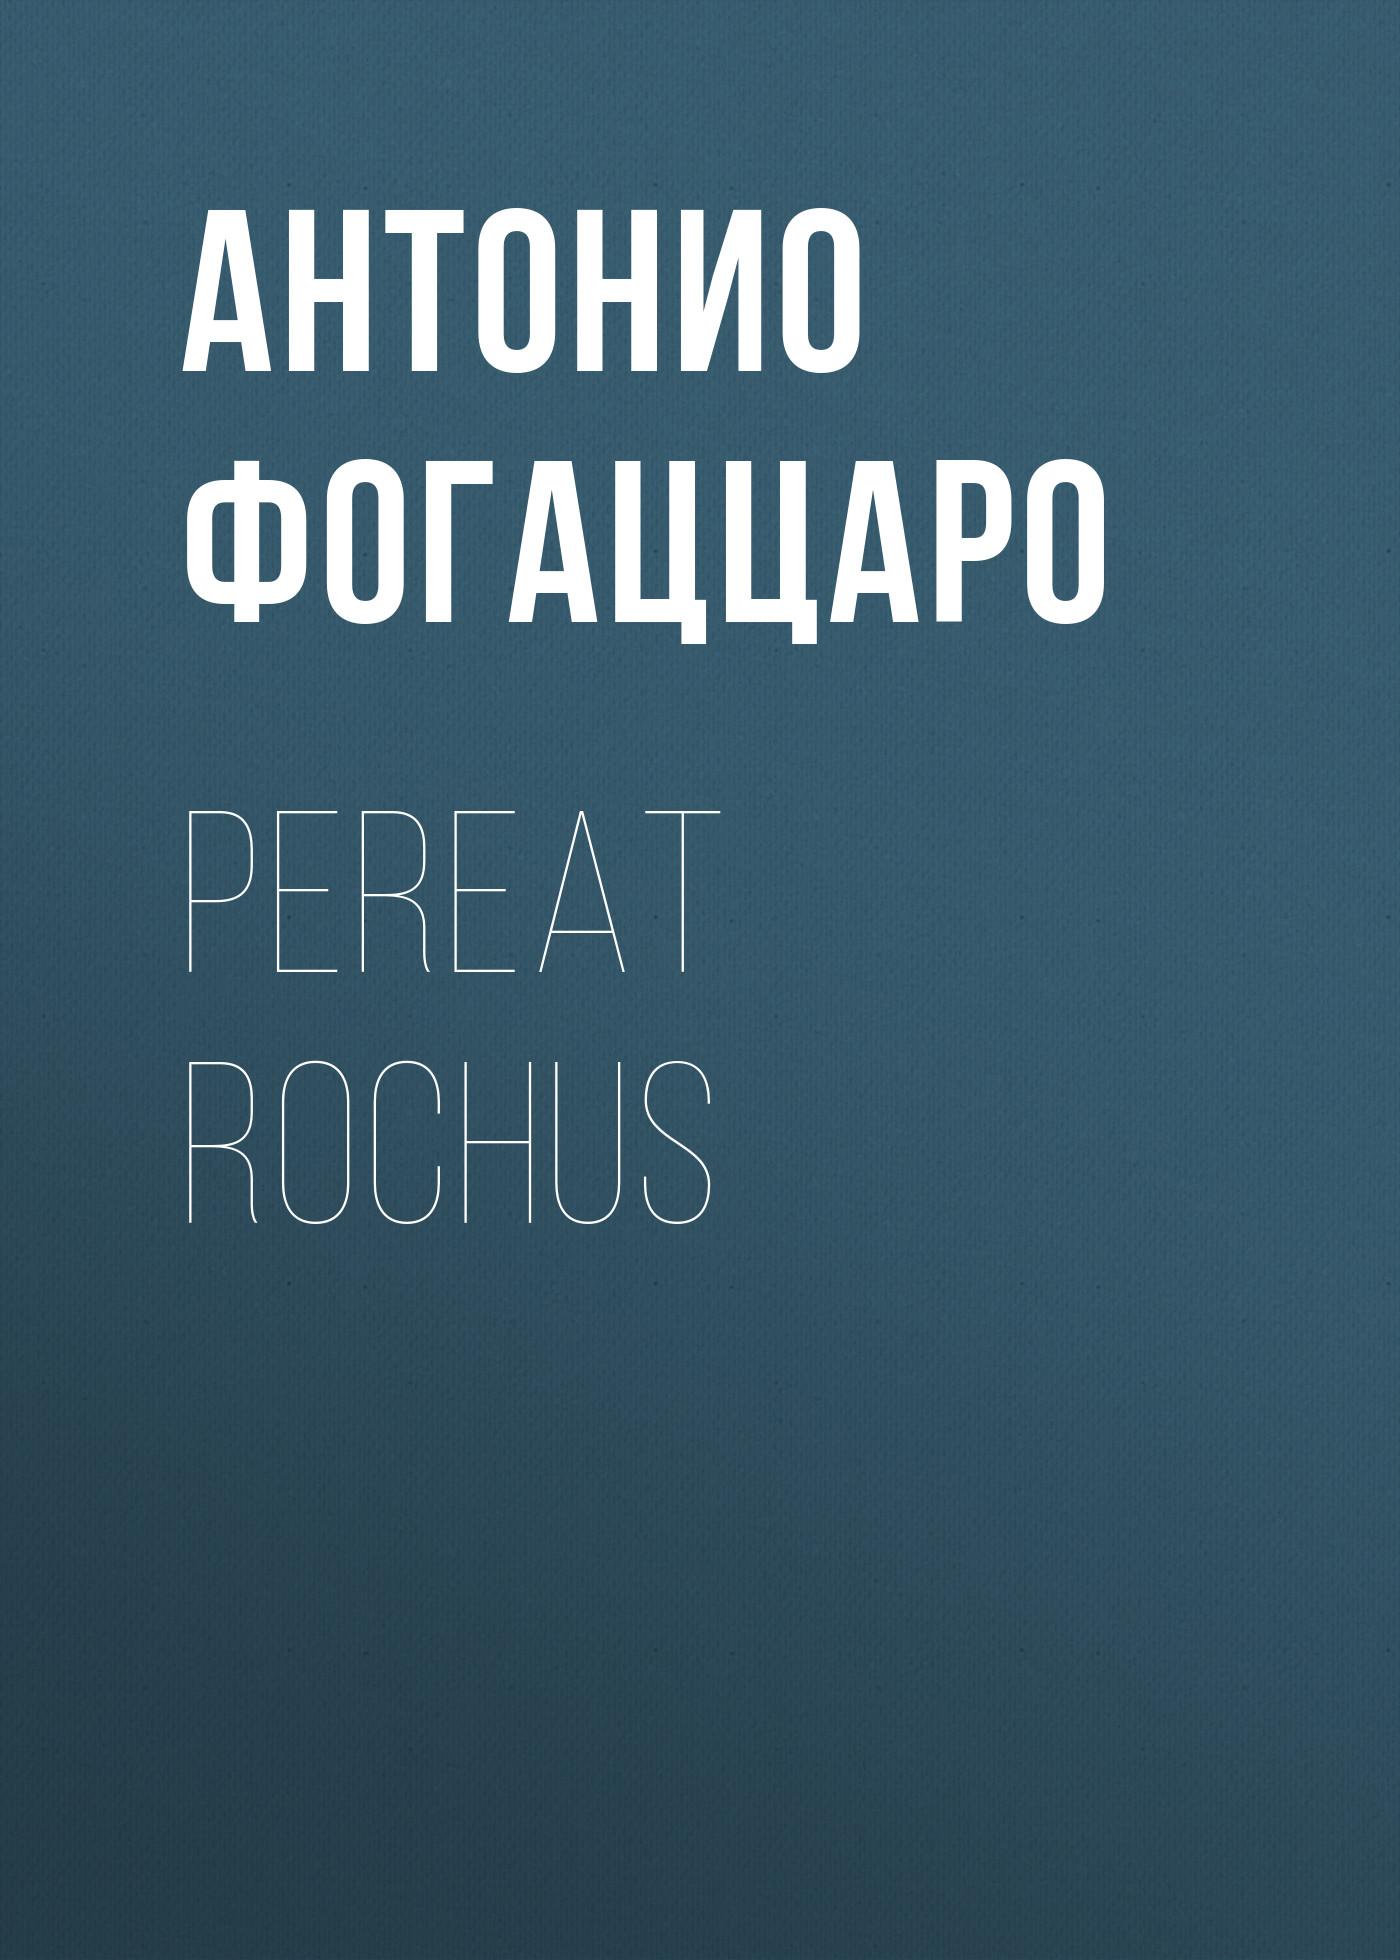 Антонио Фогаццаро Pereat Rochus vincent